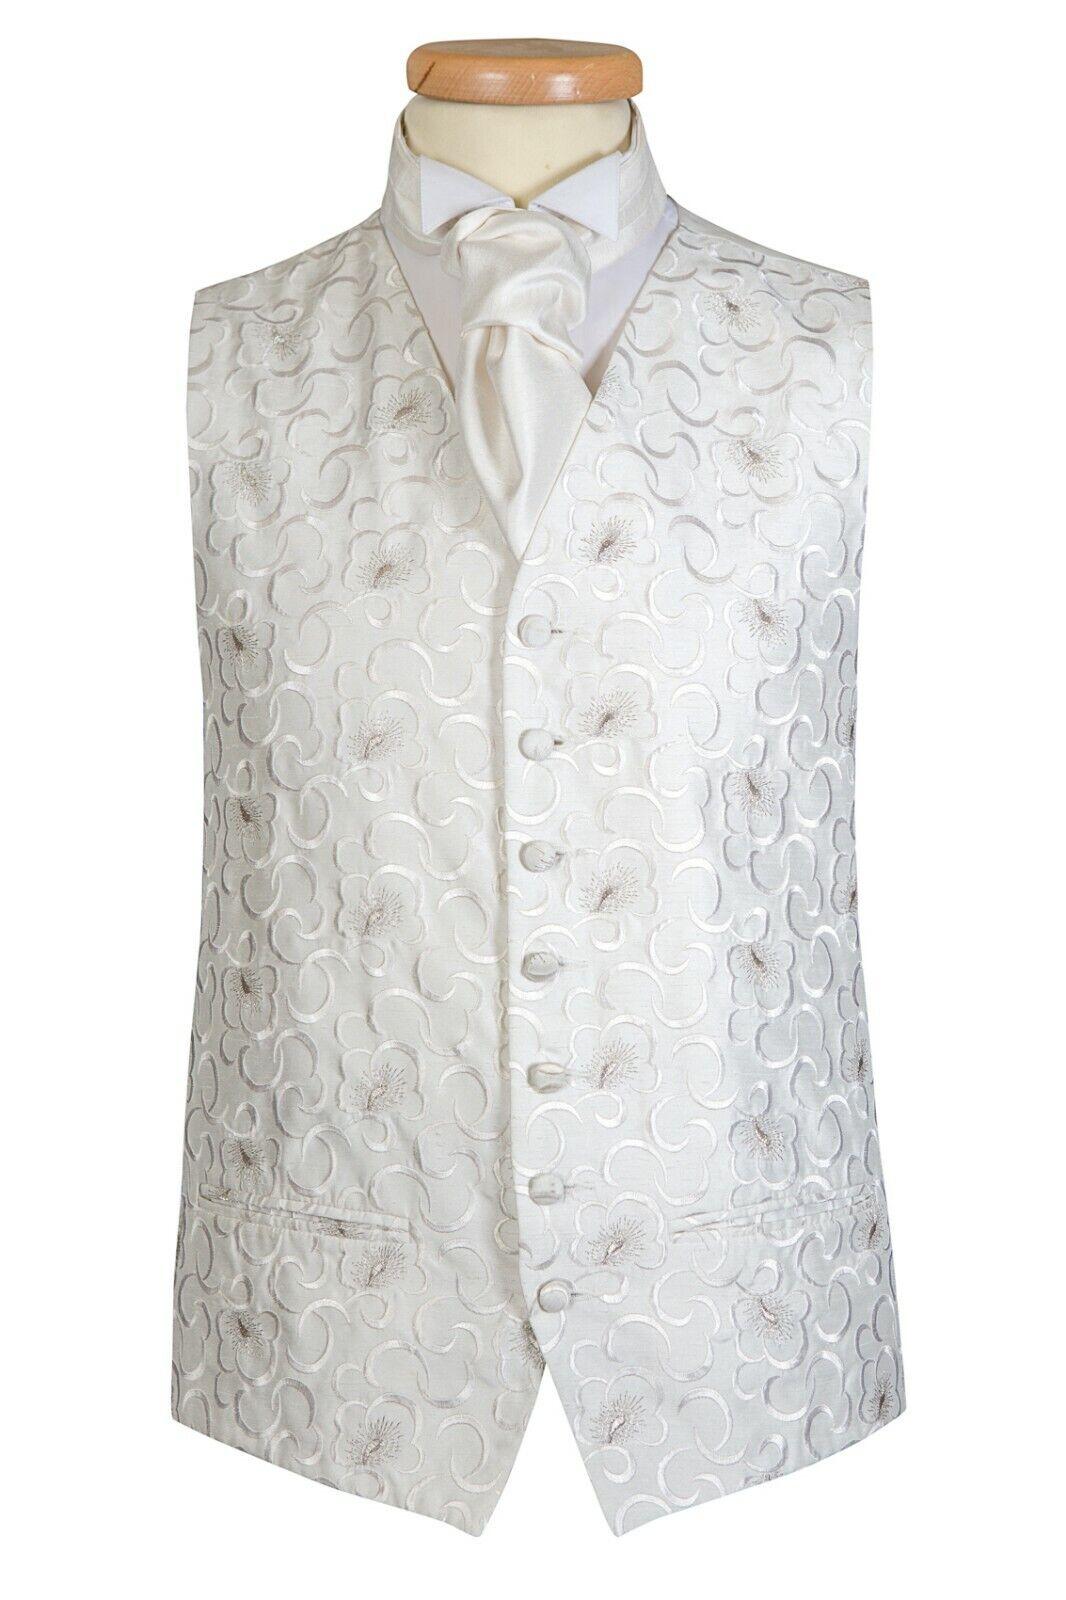 Ivory Silver Thistle Swirl Oslo Wedding Waistcoat vest UK (A24)